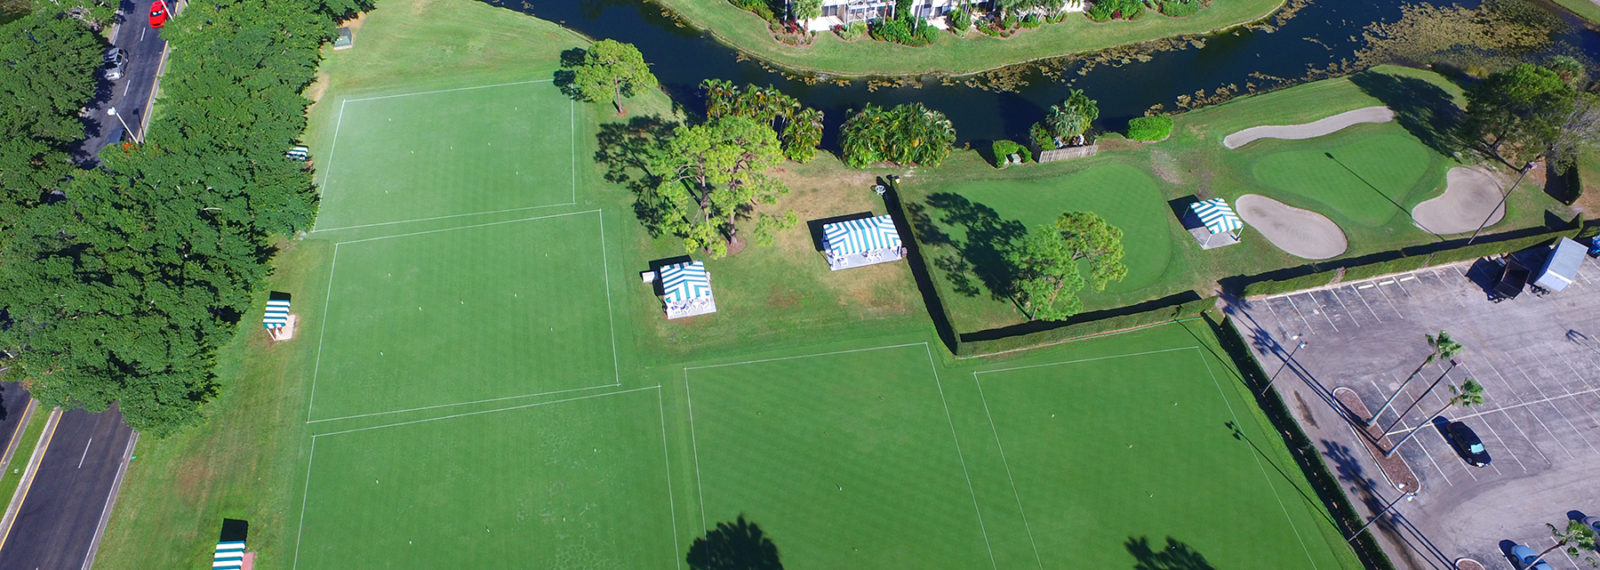 PGA National Resort & Spa - Exclusive